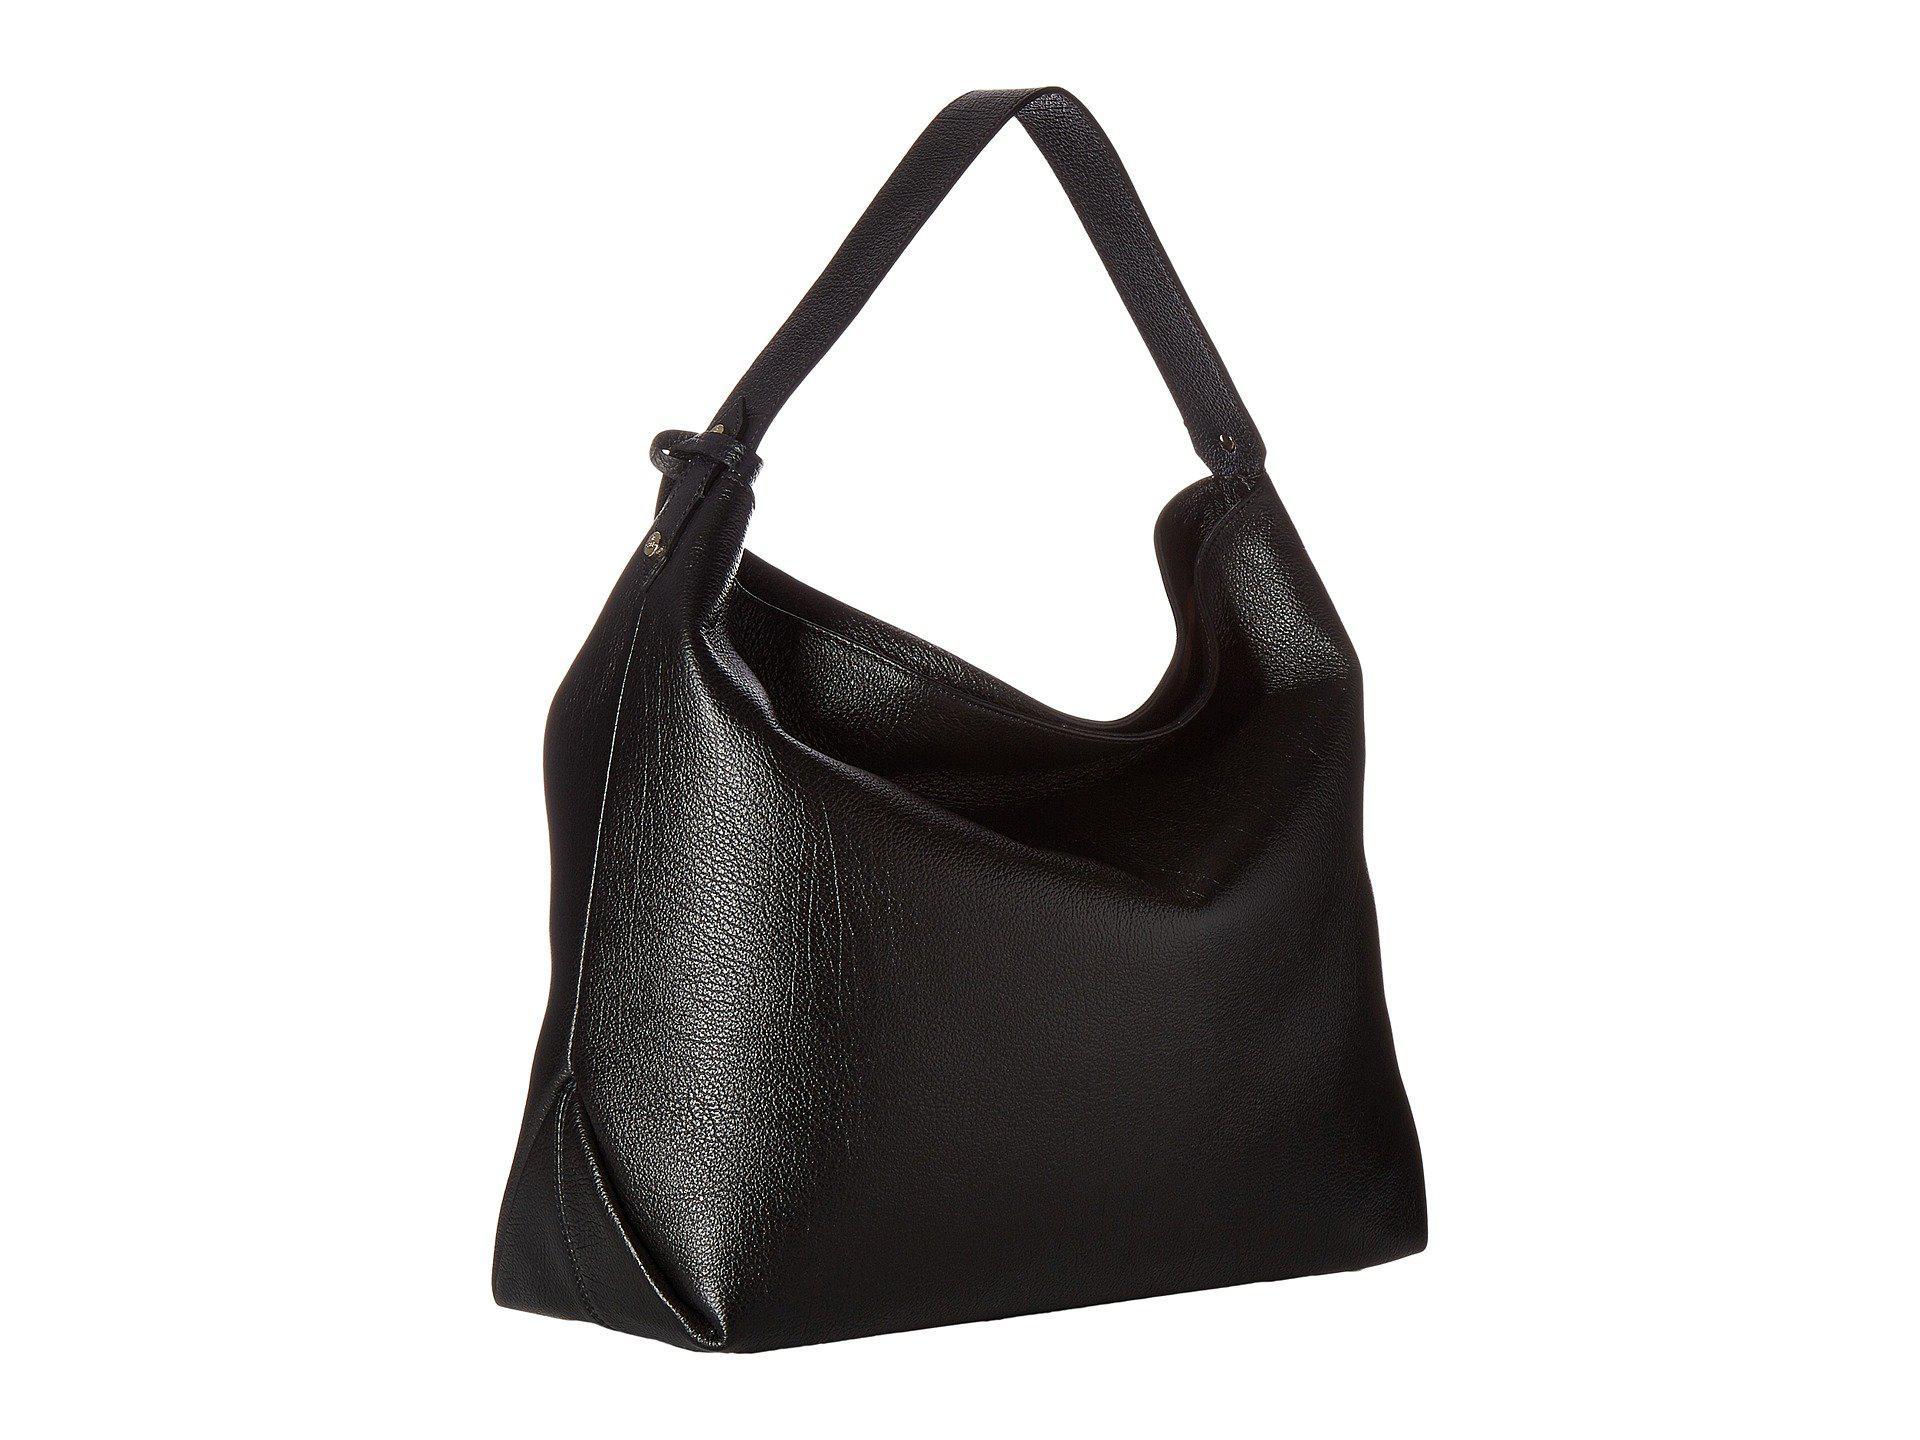 Lyst - Vivienne Westwood Balmoral Hobo Bag in Black eba717cb45996